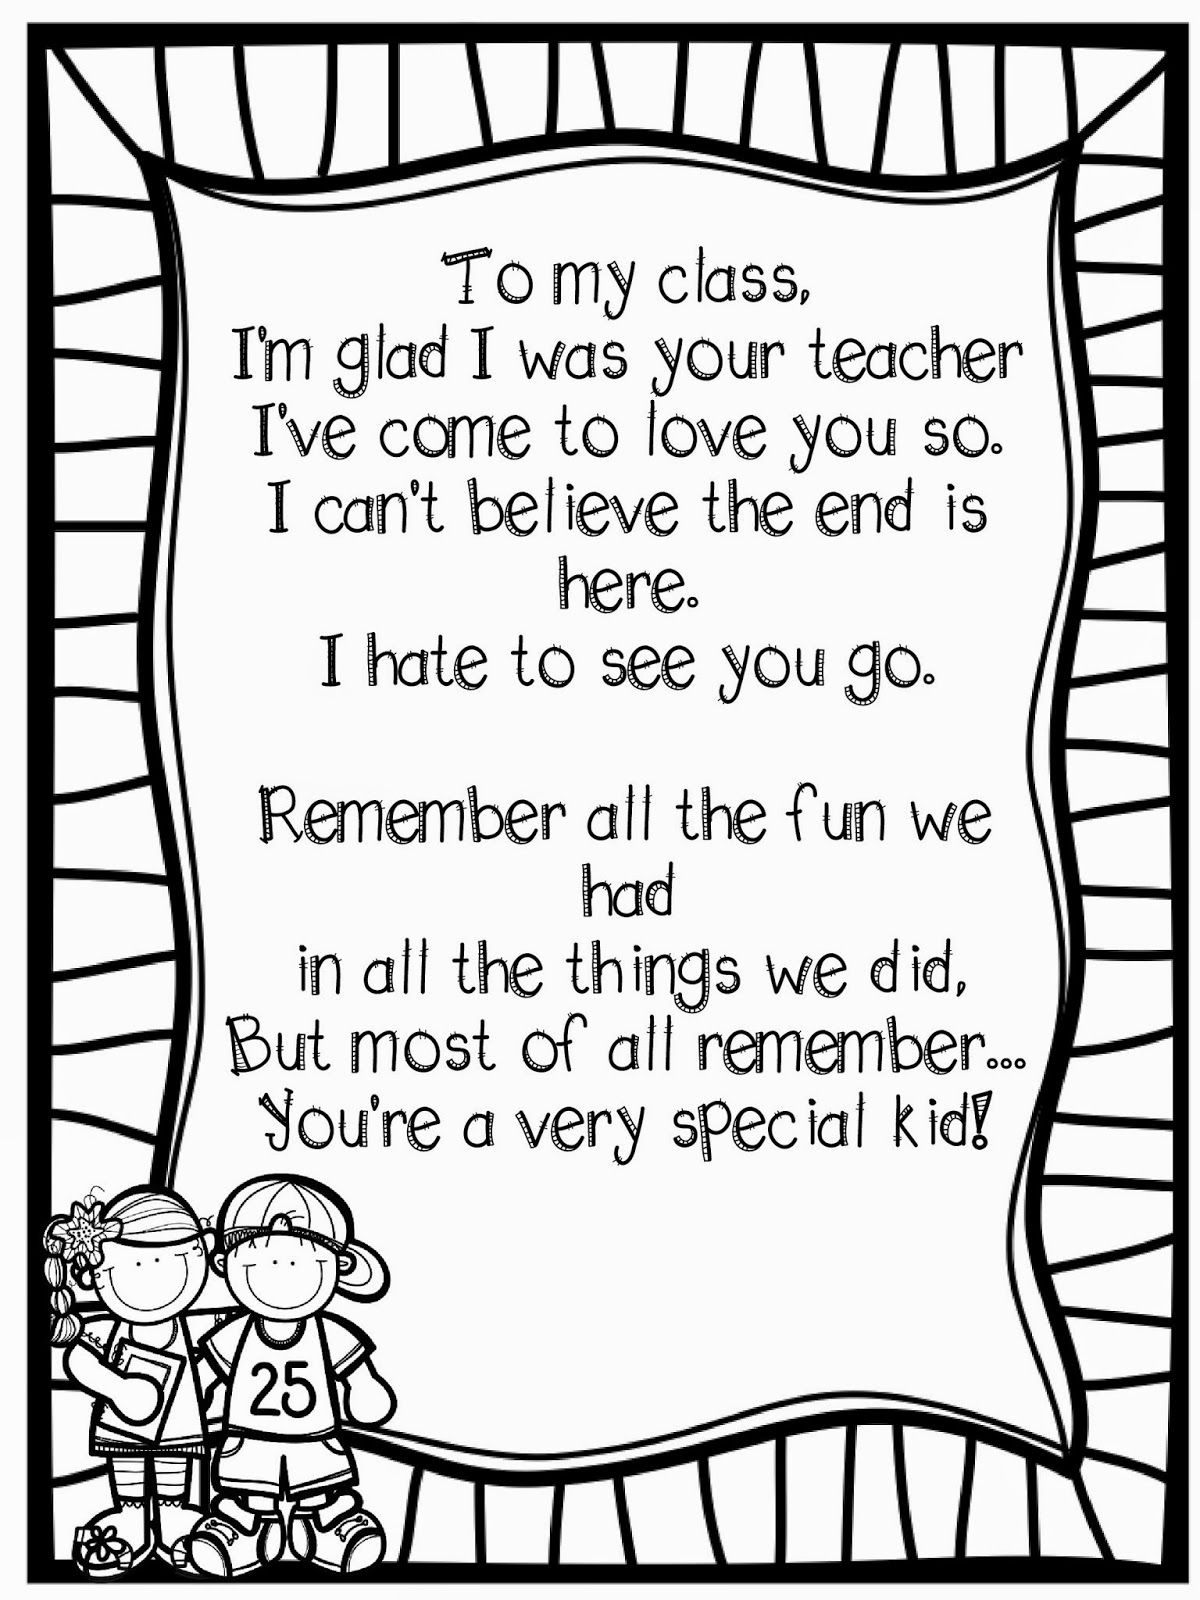 Adventures of Teaching Anyone Need a FREEBIE Poem